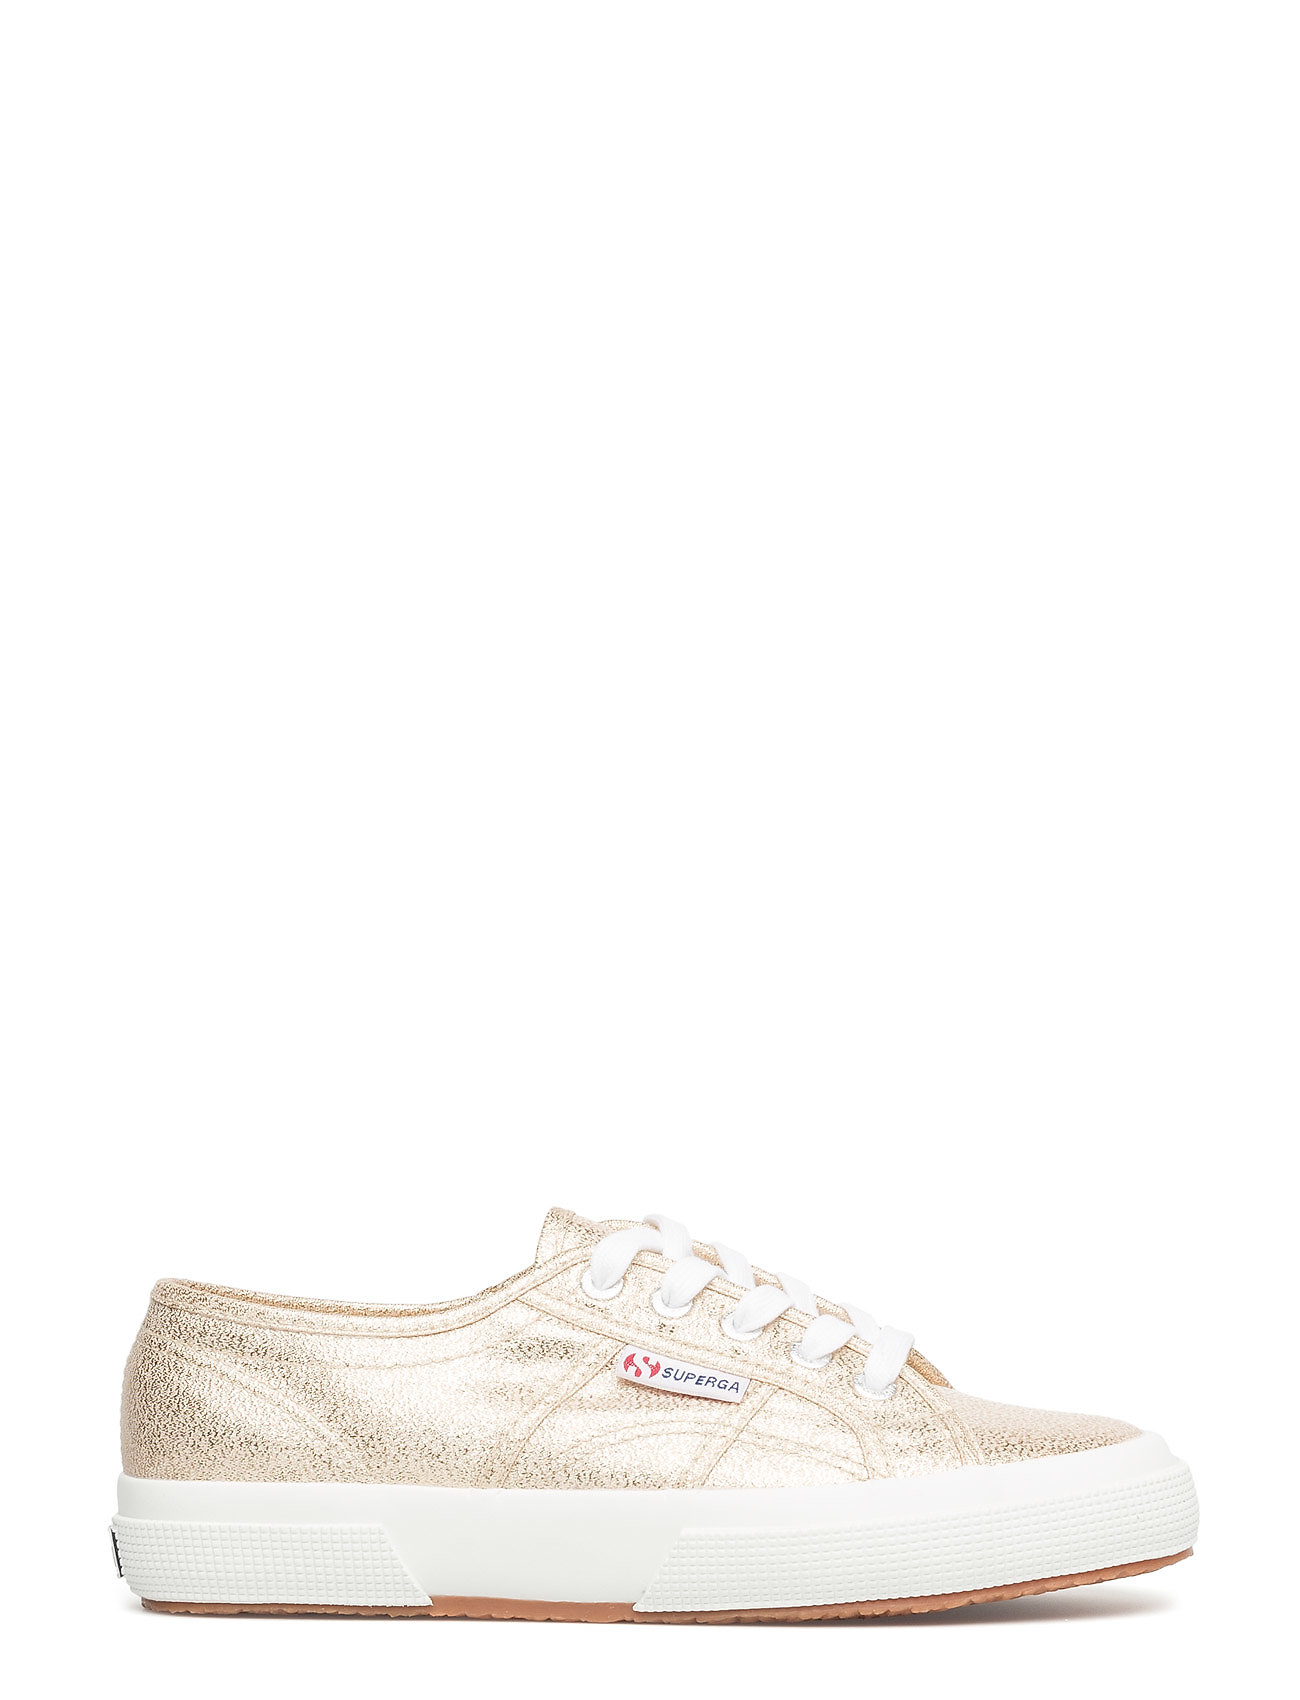 Superga 2750-Lamew Low-top Sneakers Creme Superga